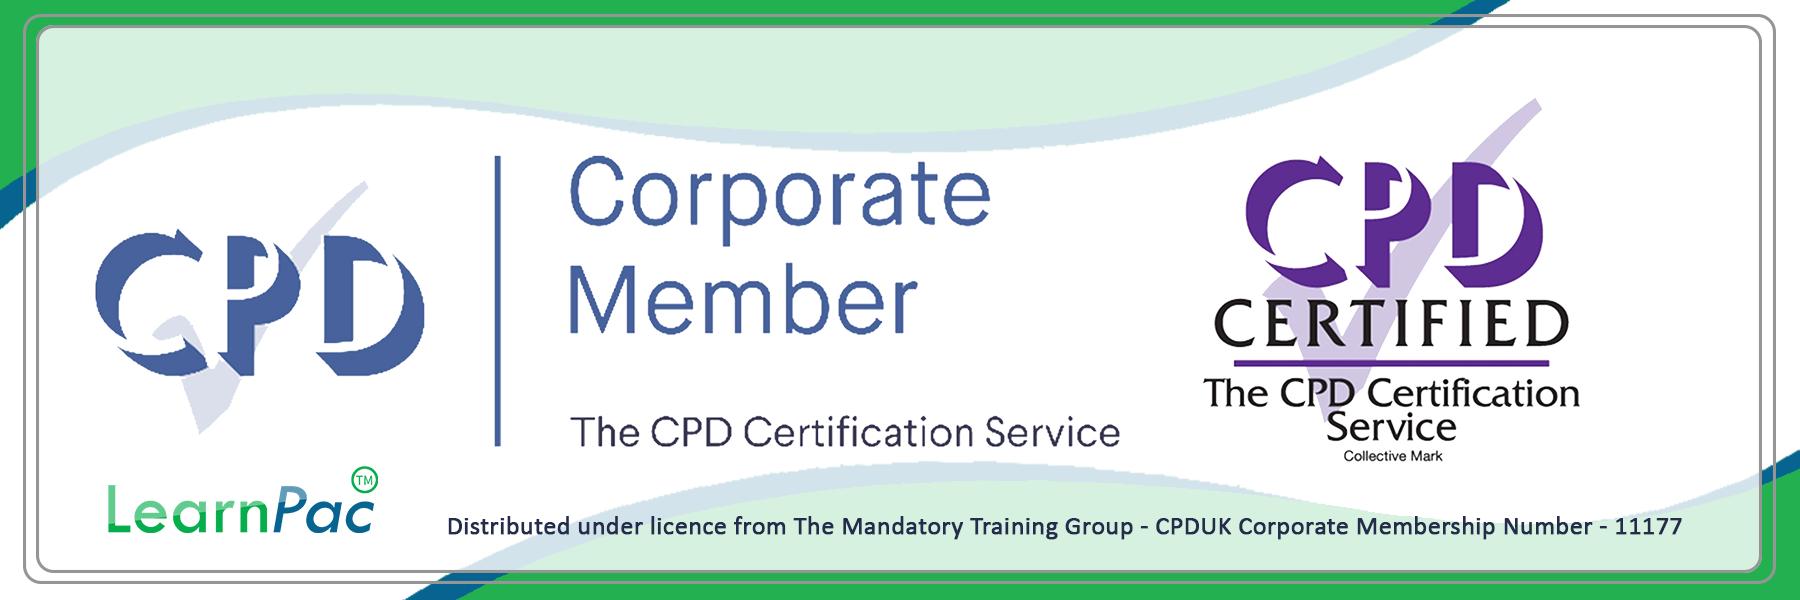 Care Certificate Standard 14 - CPDUK Certified - Learnpac System UK -